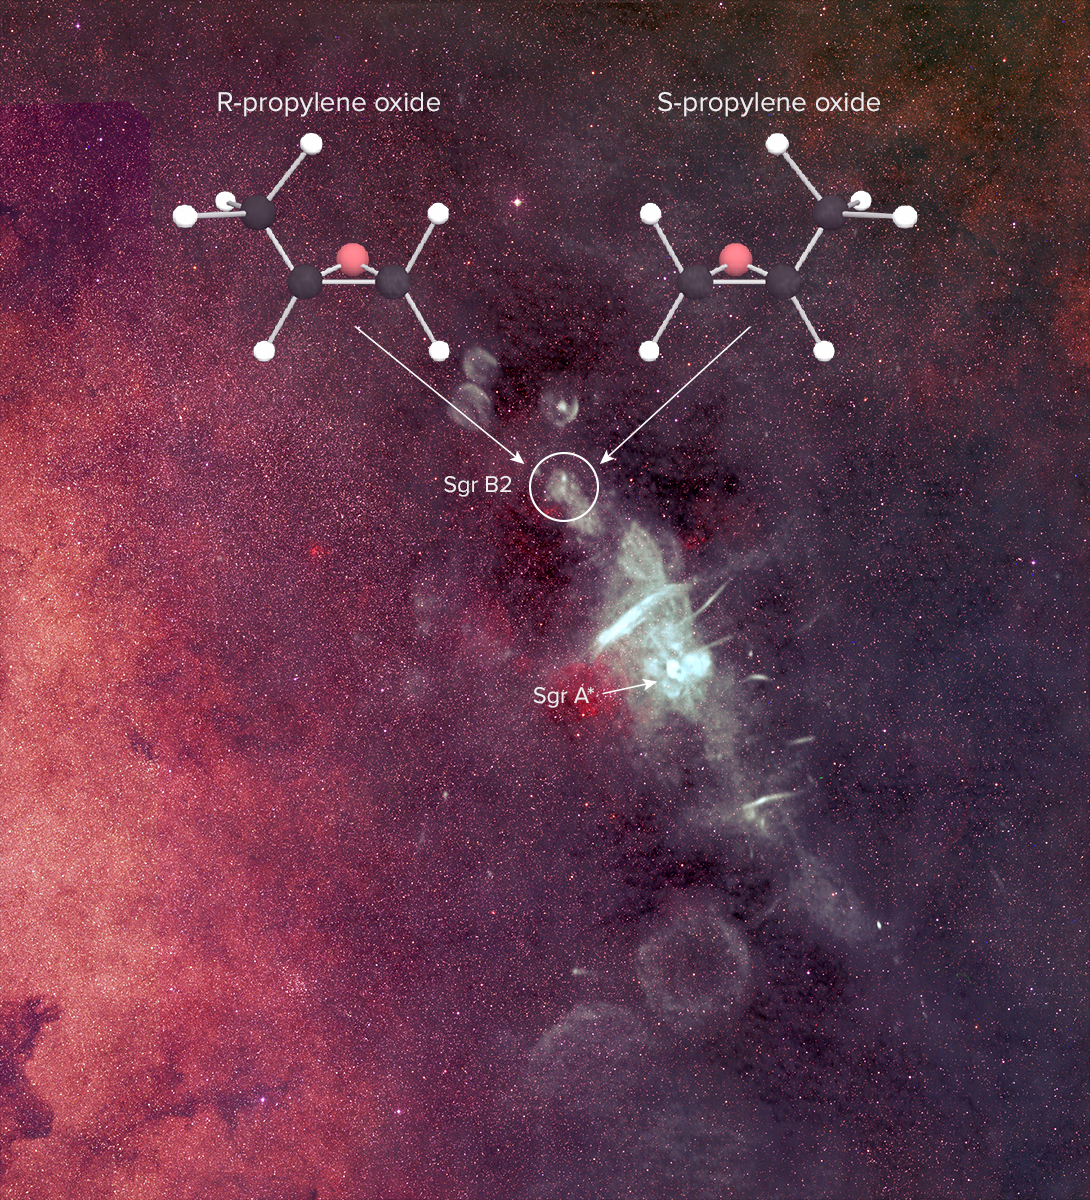 Interstellar molecule could help solve life mystery